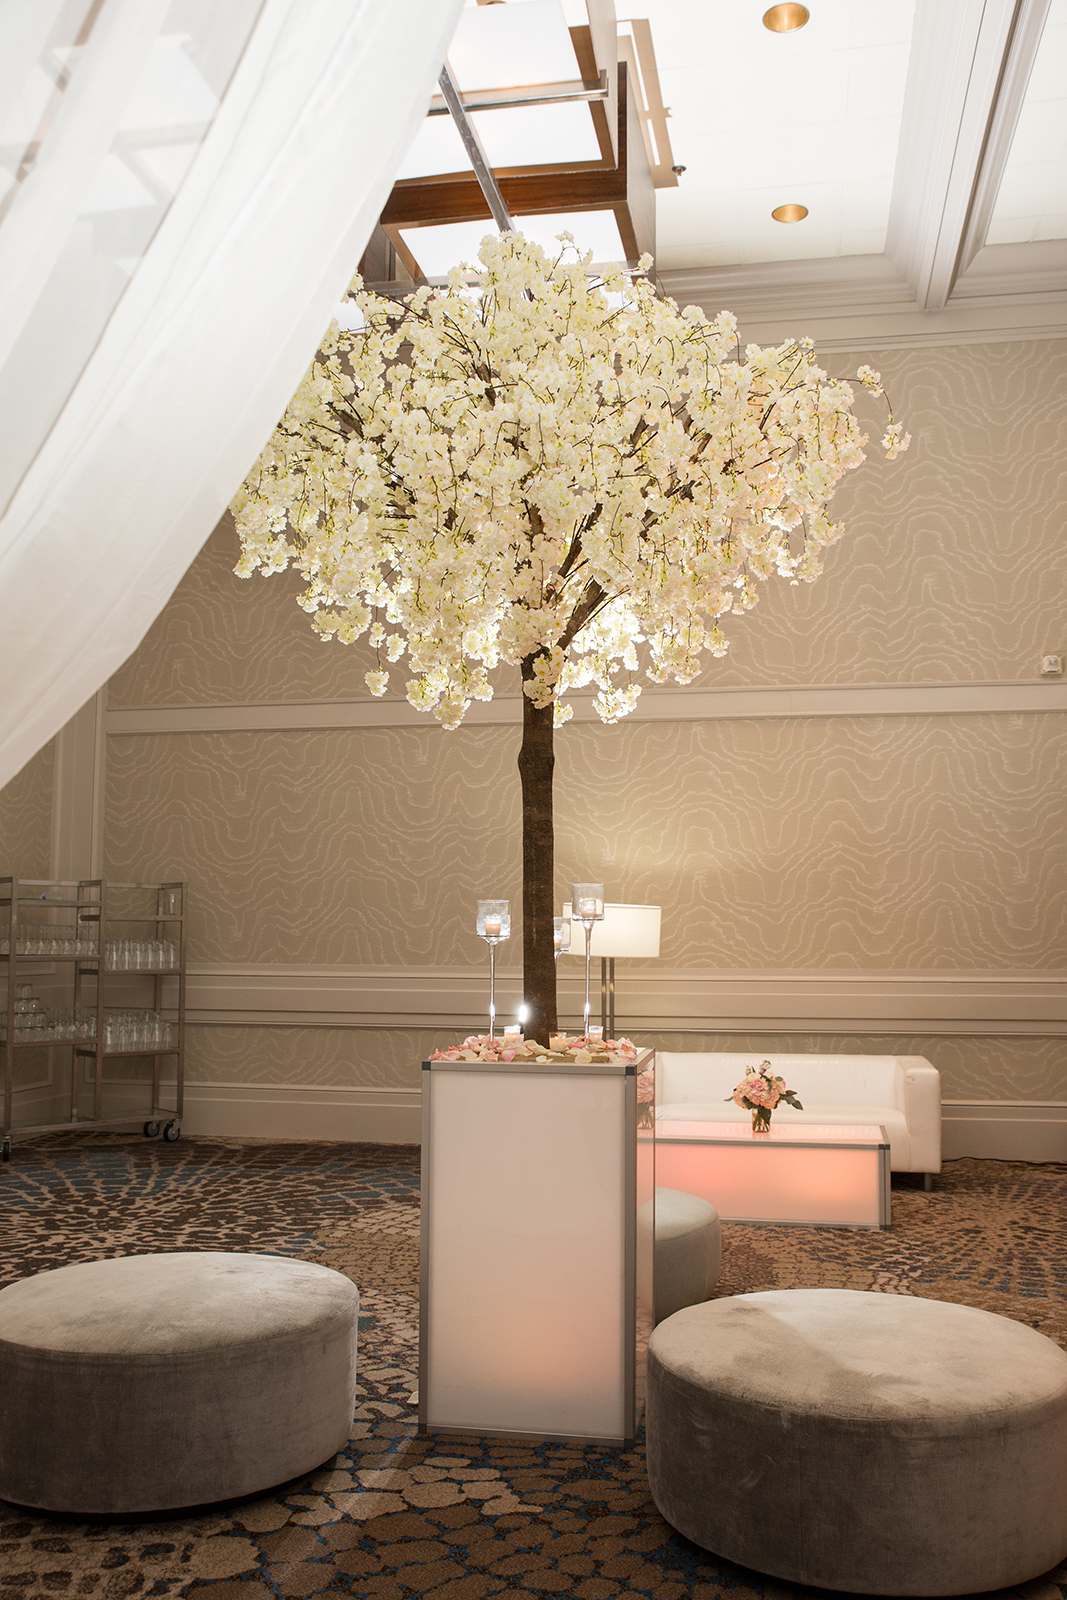 Le Cape Weddings - Sumeet and Chavi - Reception Details  -37.jpg